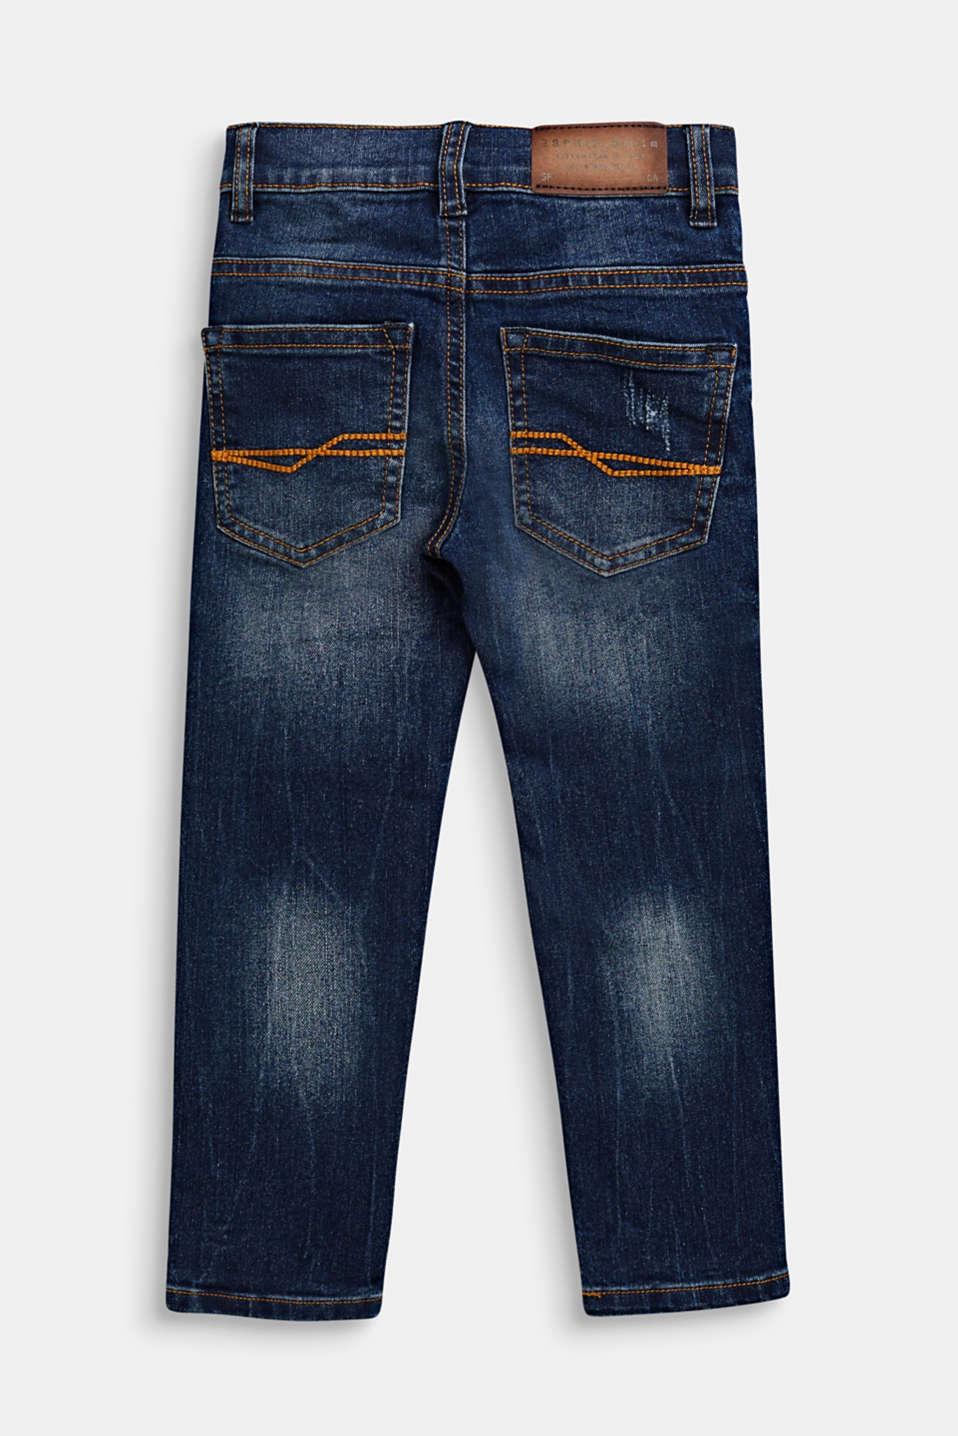 Pants denim, LCDARK INDIGO DE, detail image number 1